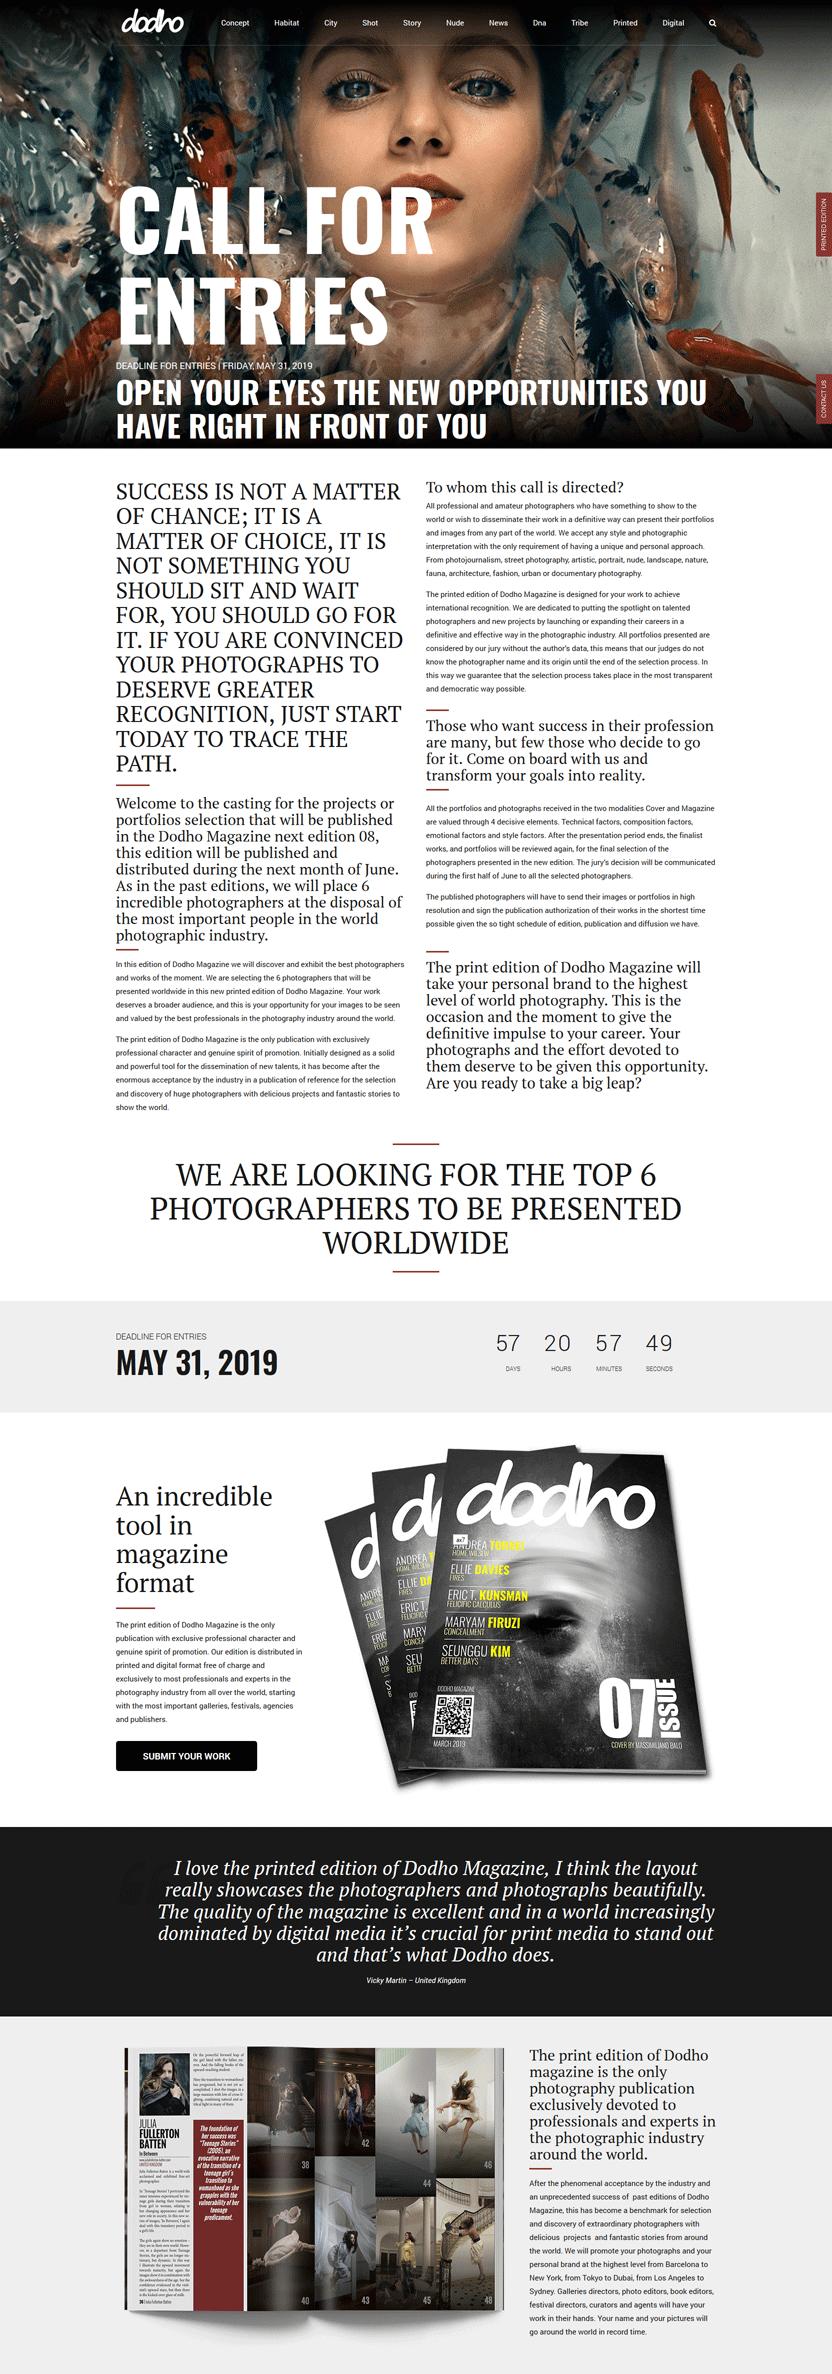 Призыв для заявок журнала Dodho